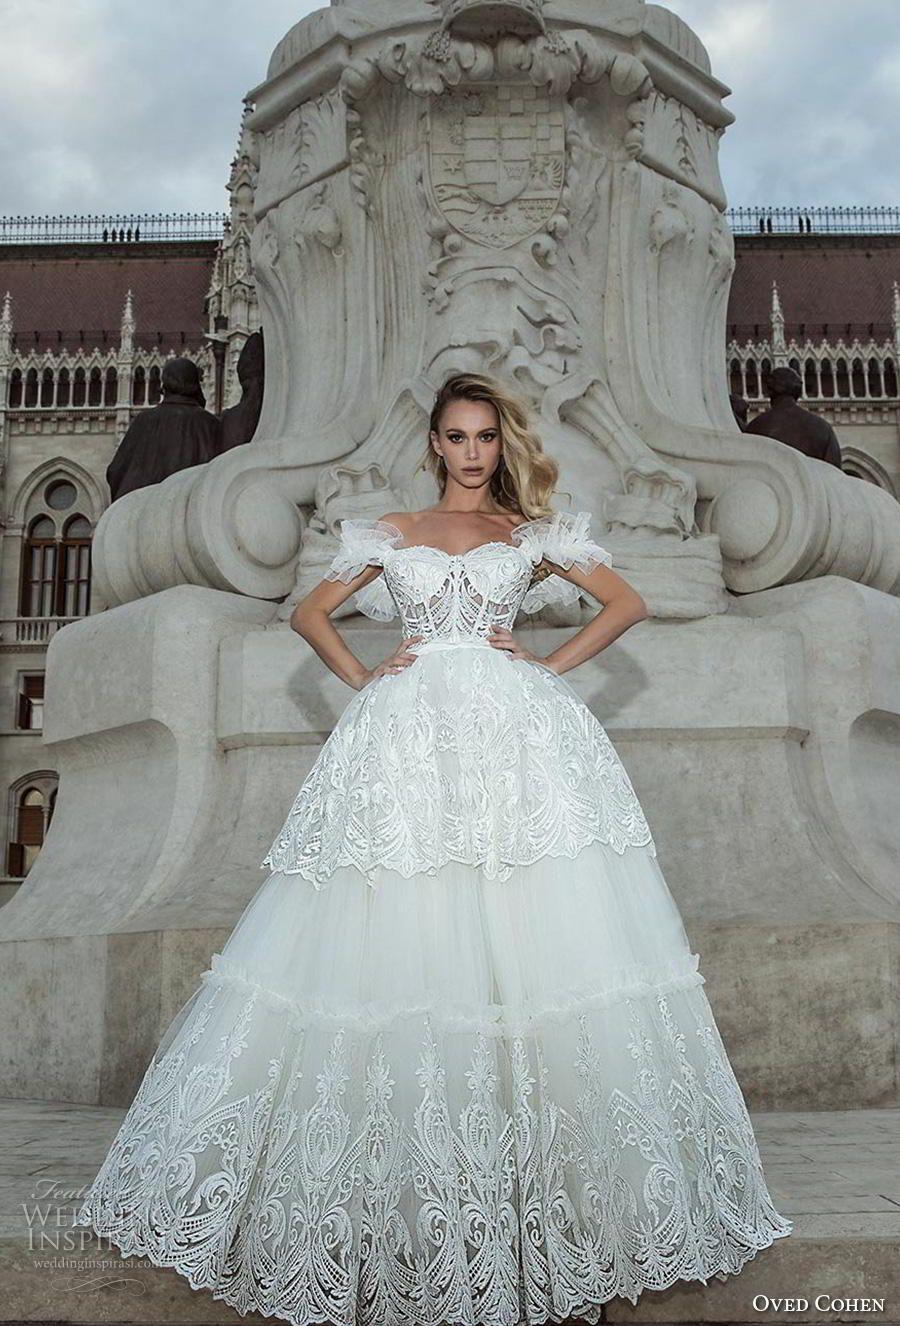 Oved cohen wedding dresses robes de mariée weeding dress